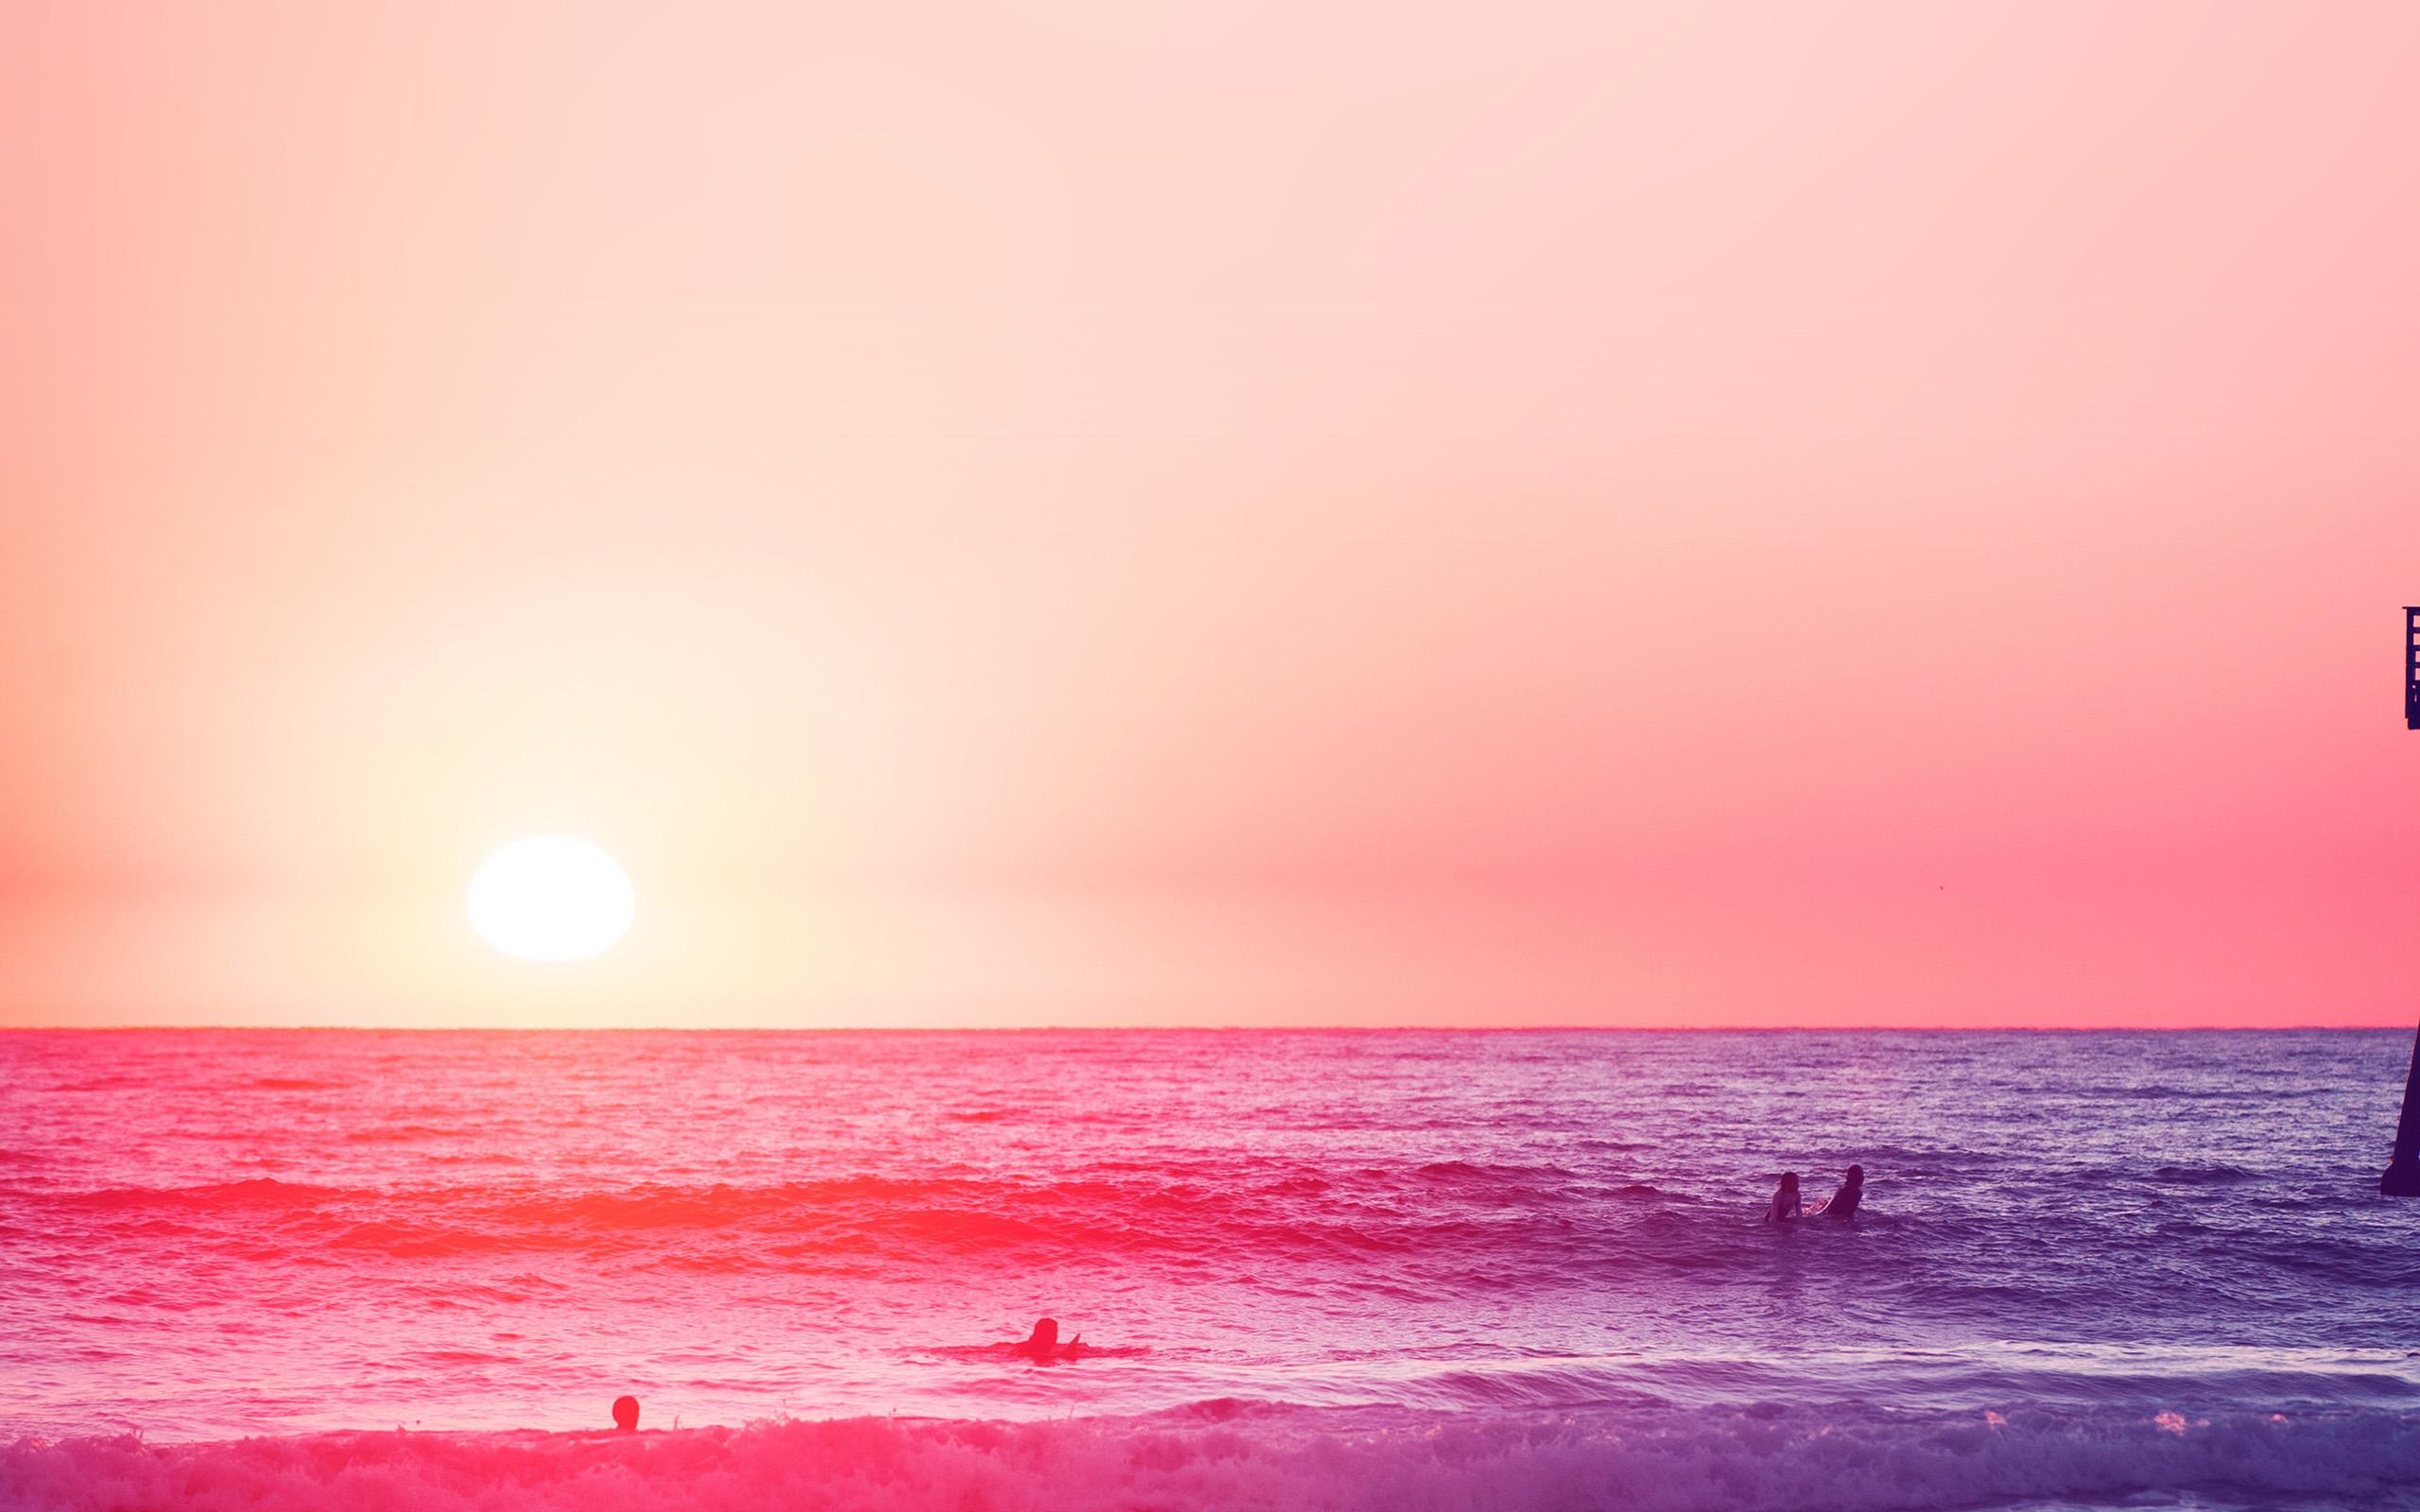 Anime 2014 Wallpaper Wallpaper For Desktop Laptop Mw95 Happy Beach Sea